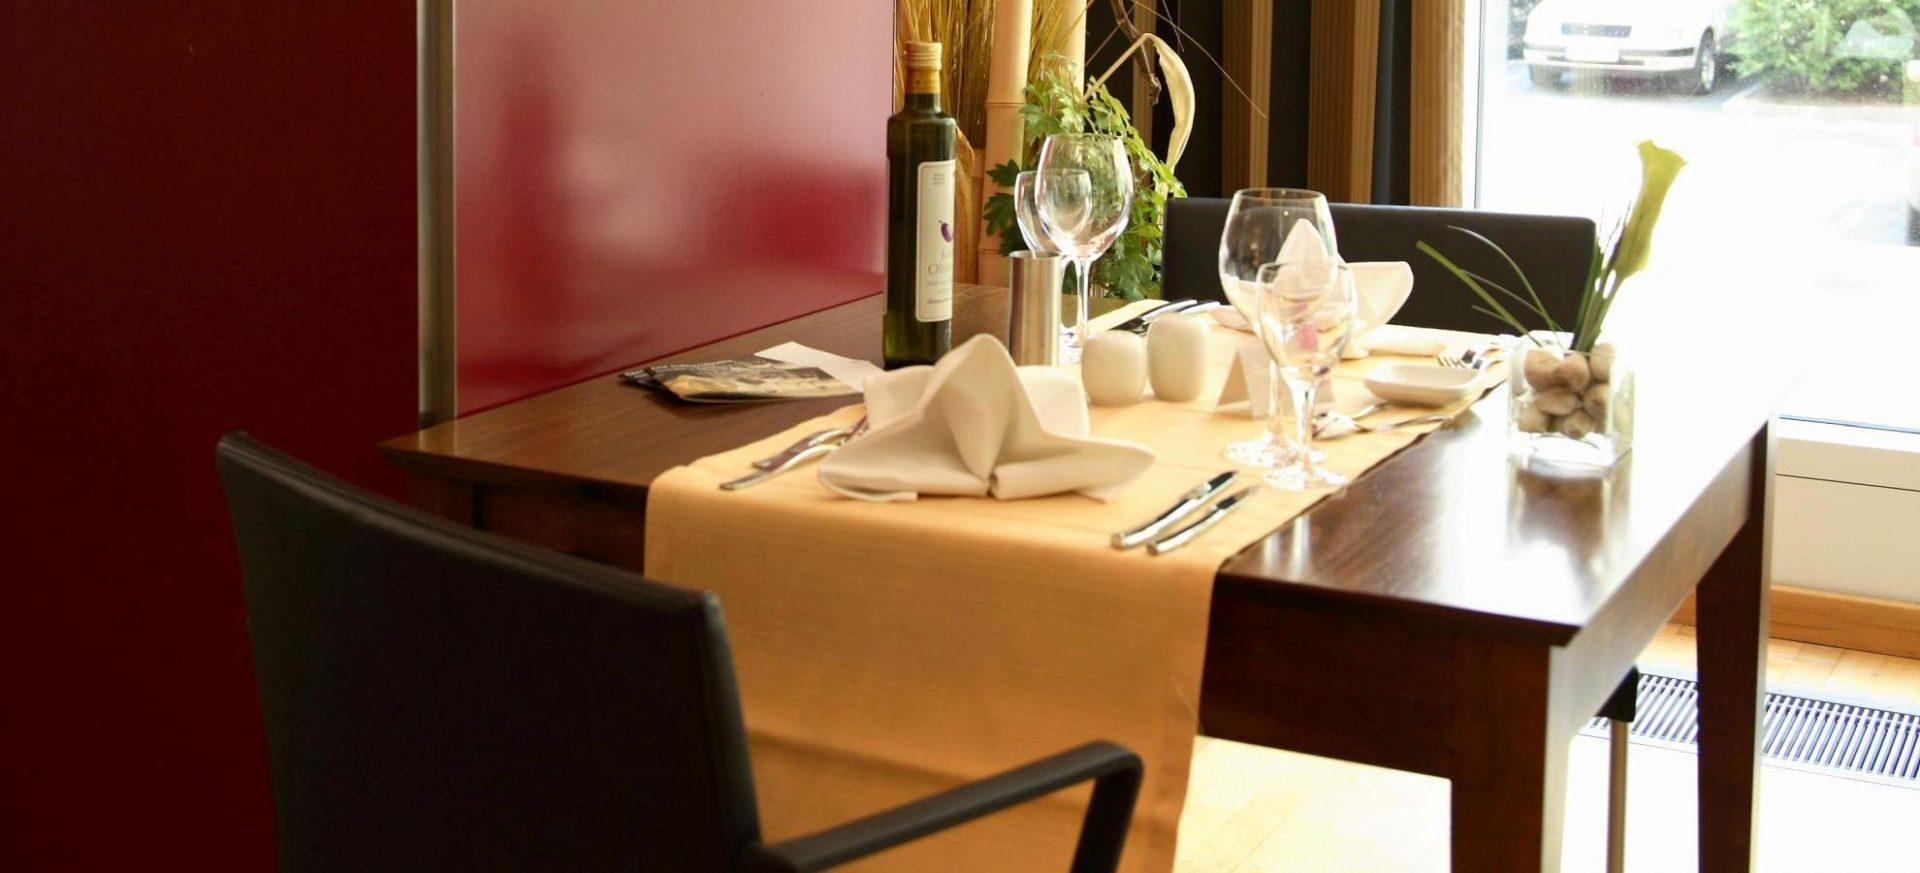 Radisson Blu Hotel Erfurt Bistro Classico